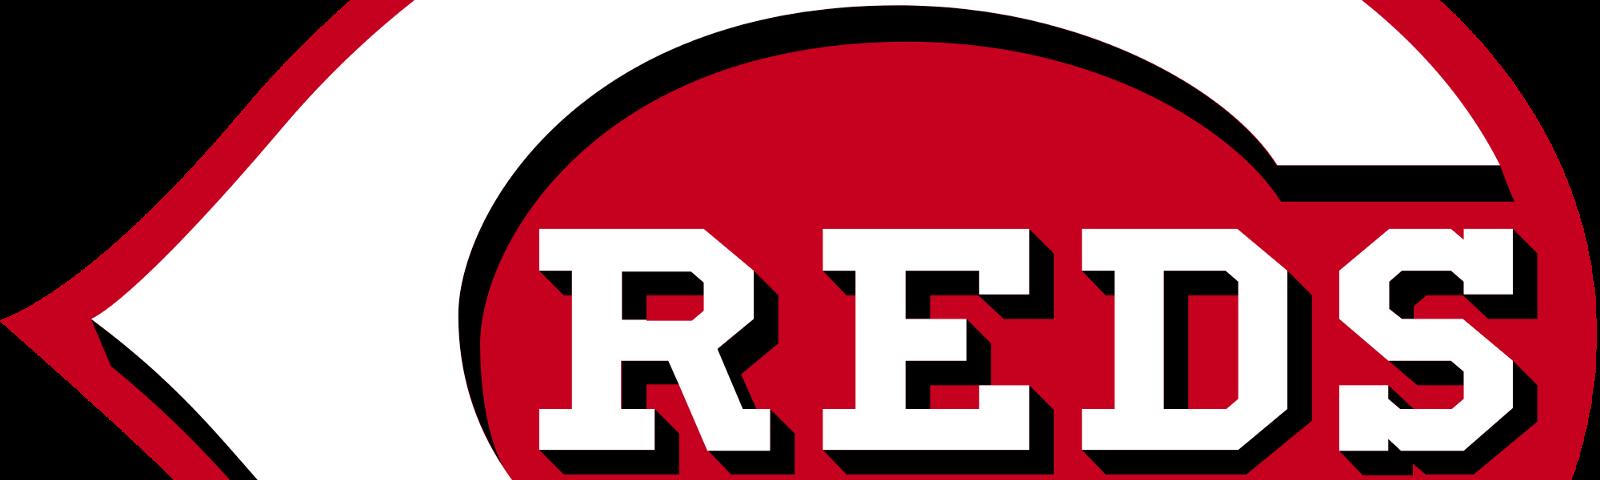 Cincinnati reds logo clipart clipart black and white library Cincinnati Reds Logo Png - Clip Art Library clipart black and white library